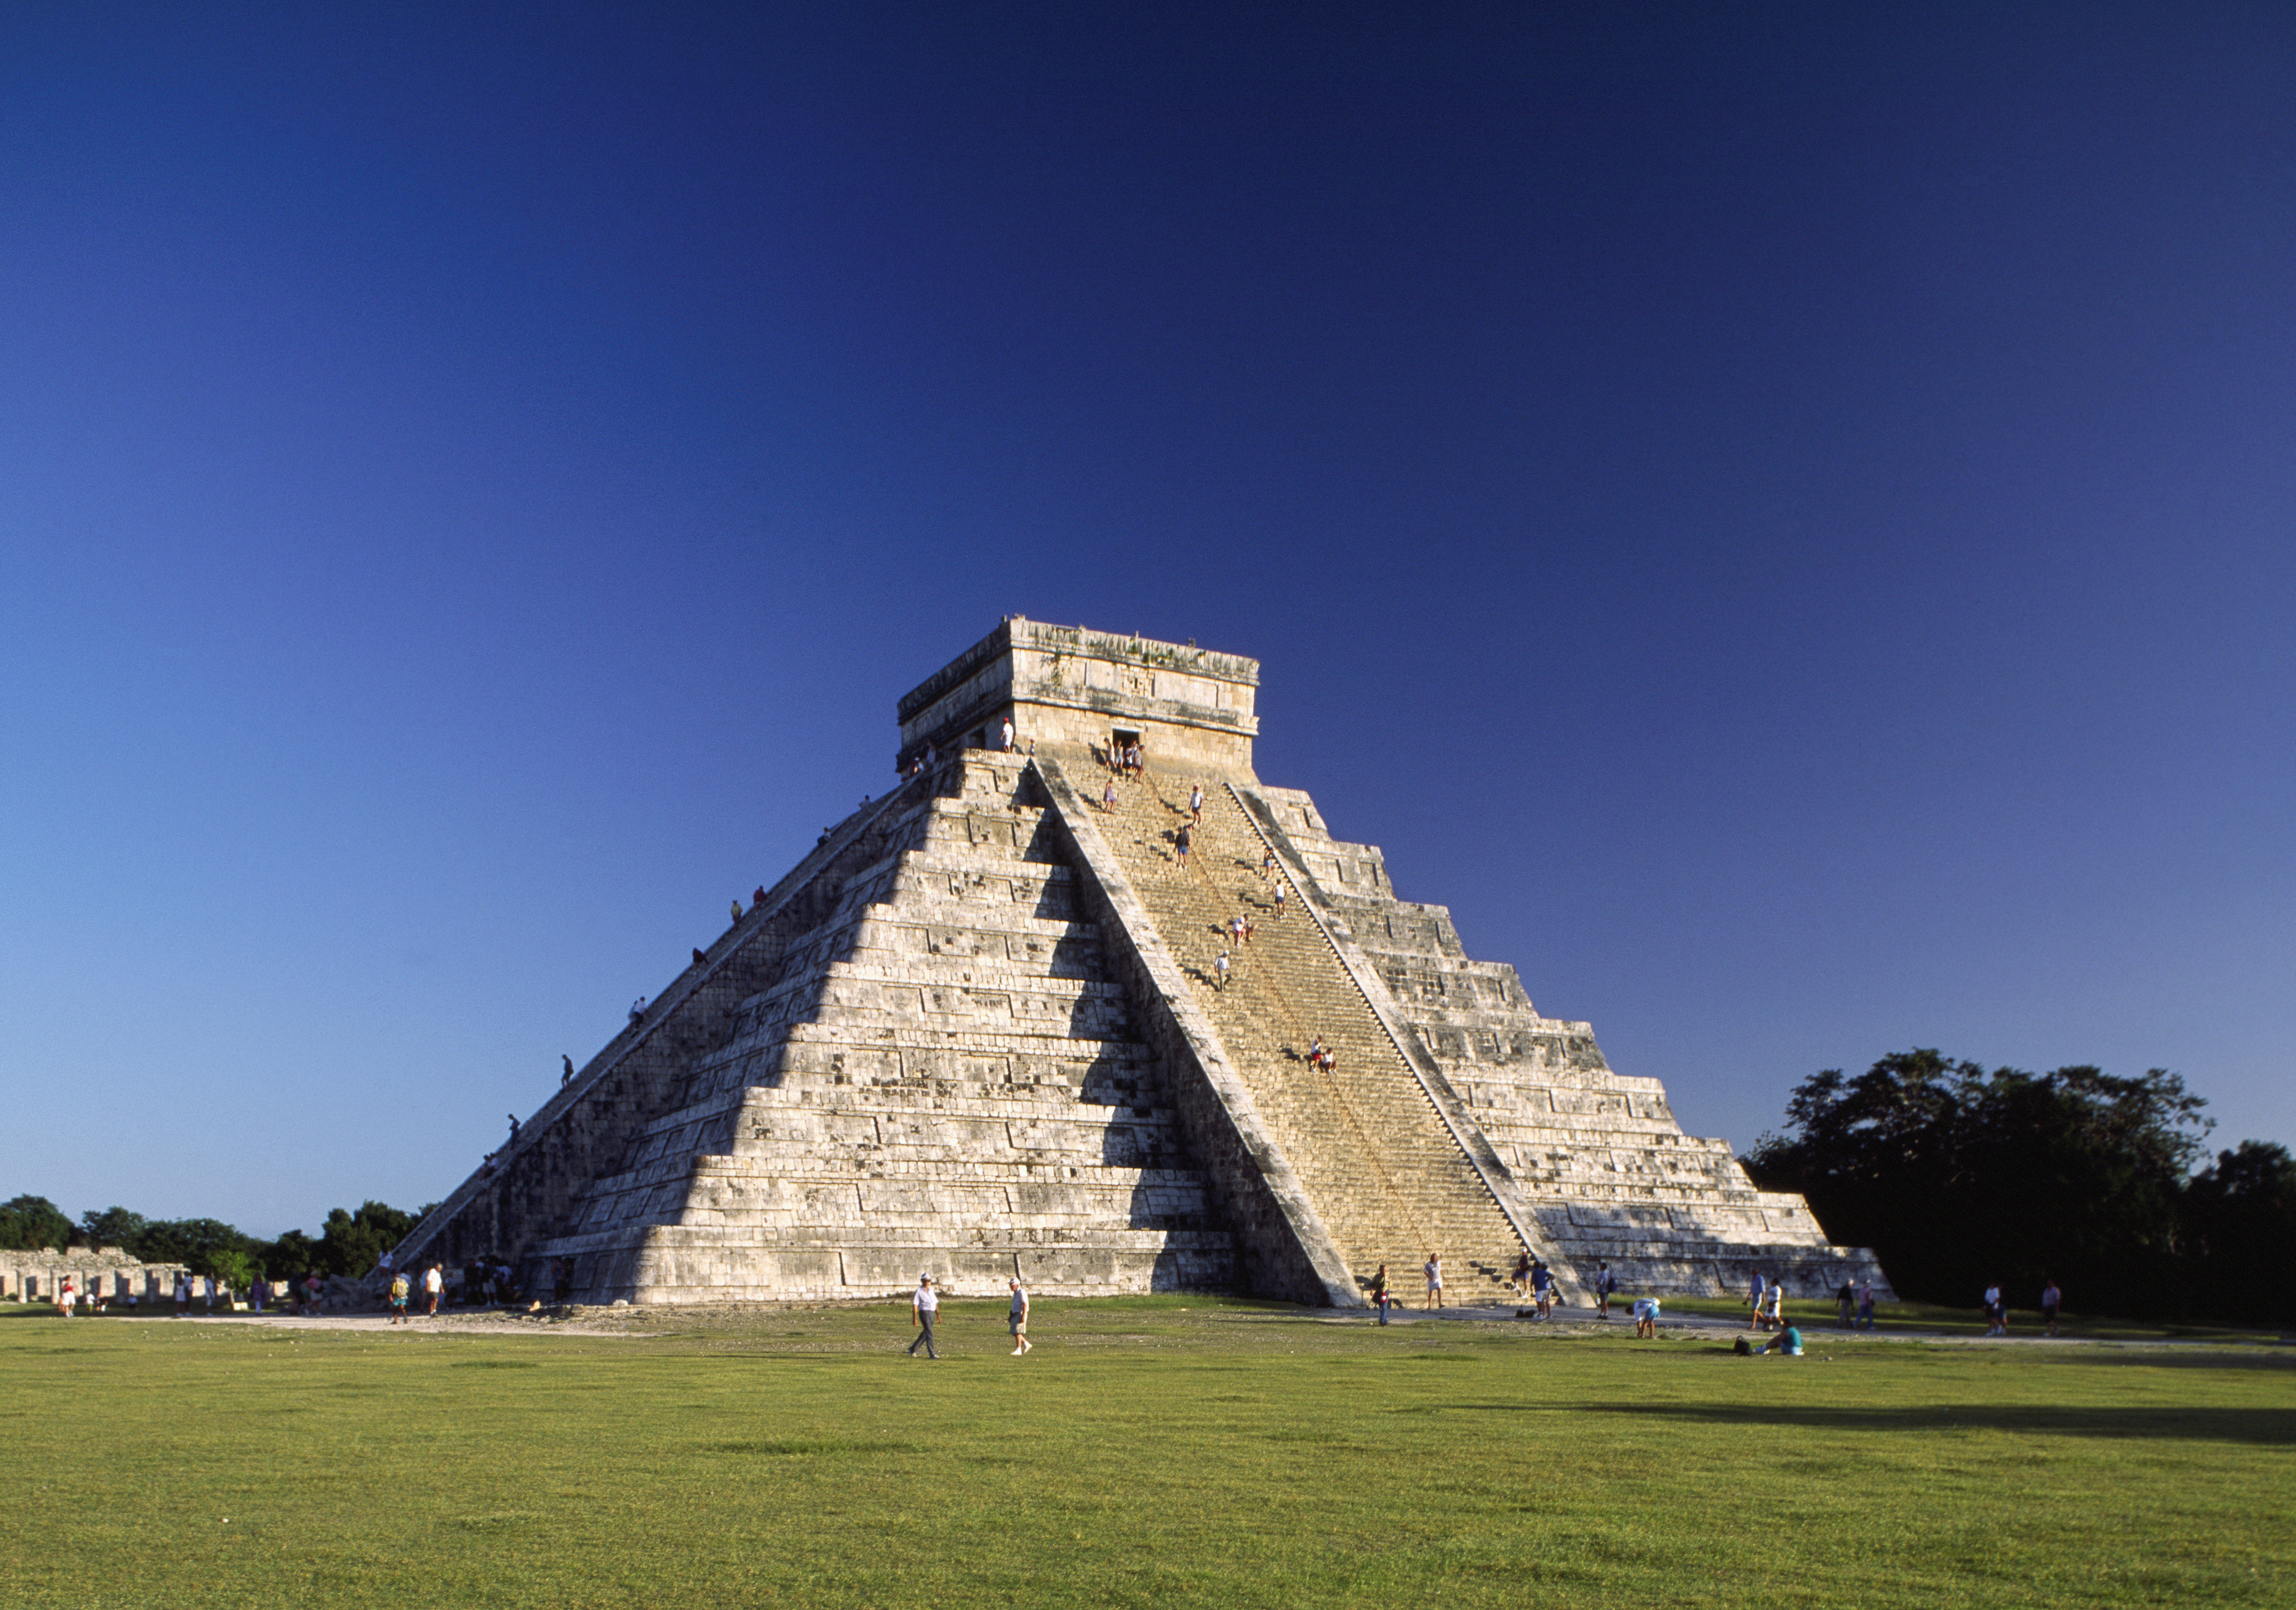 Mesoamerican pyramids pictures pyramids in latin america history el castillo the castle the main plaza ancient maya city chicken itza gumiabroncs Choice Image